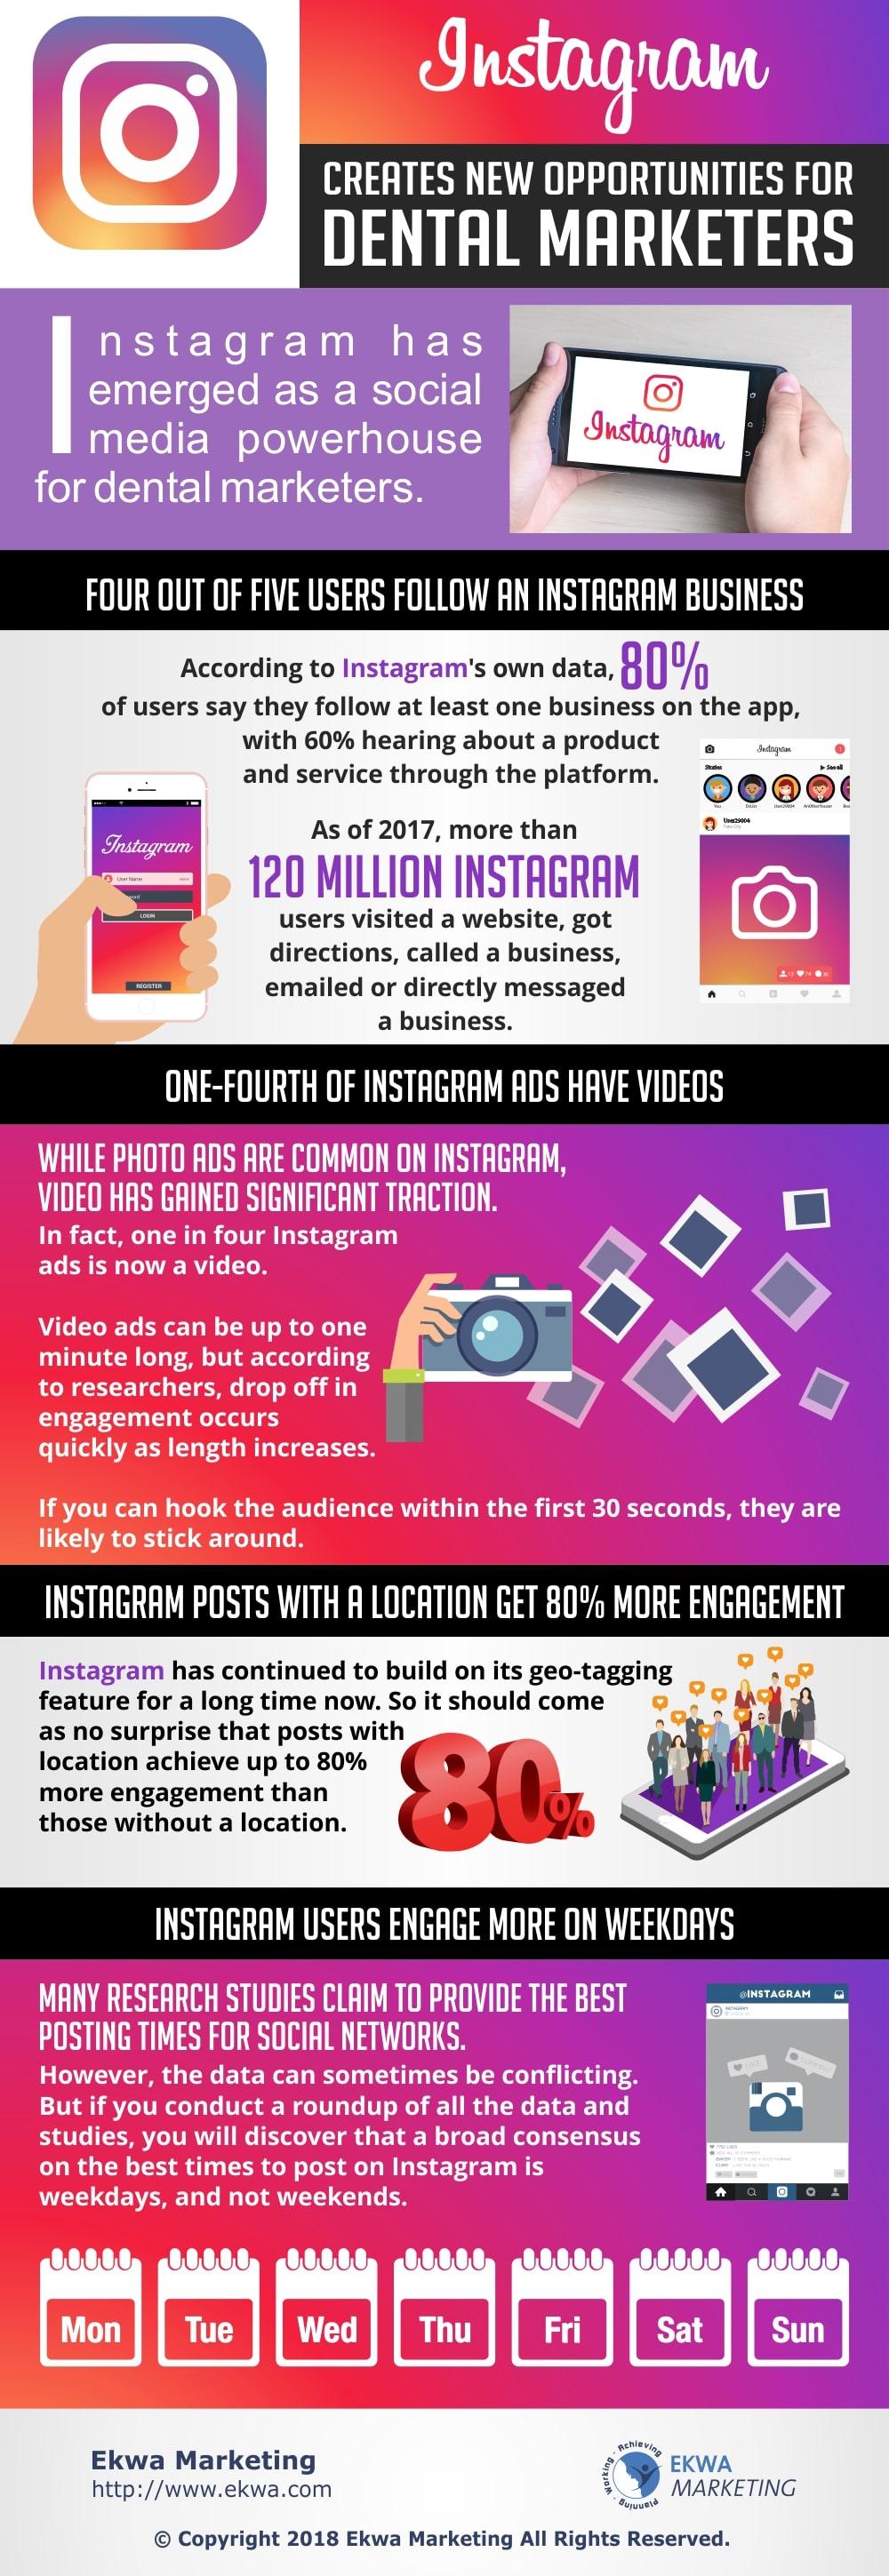 Instagram Opportunities for Dental Marketers